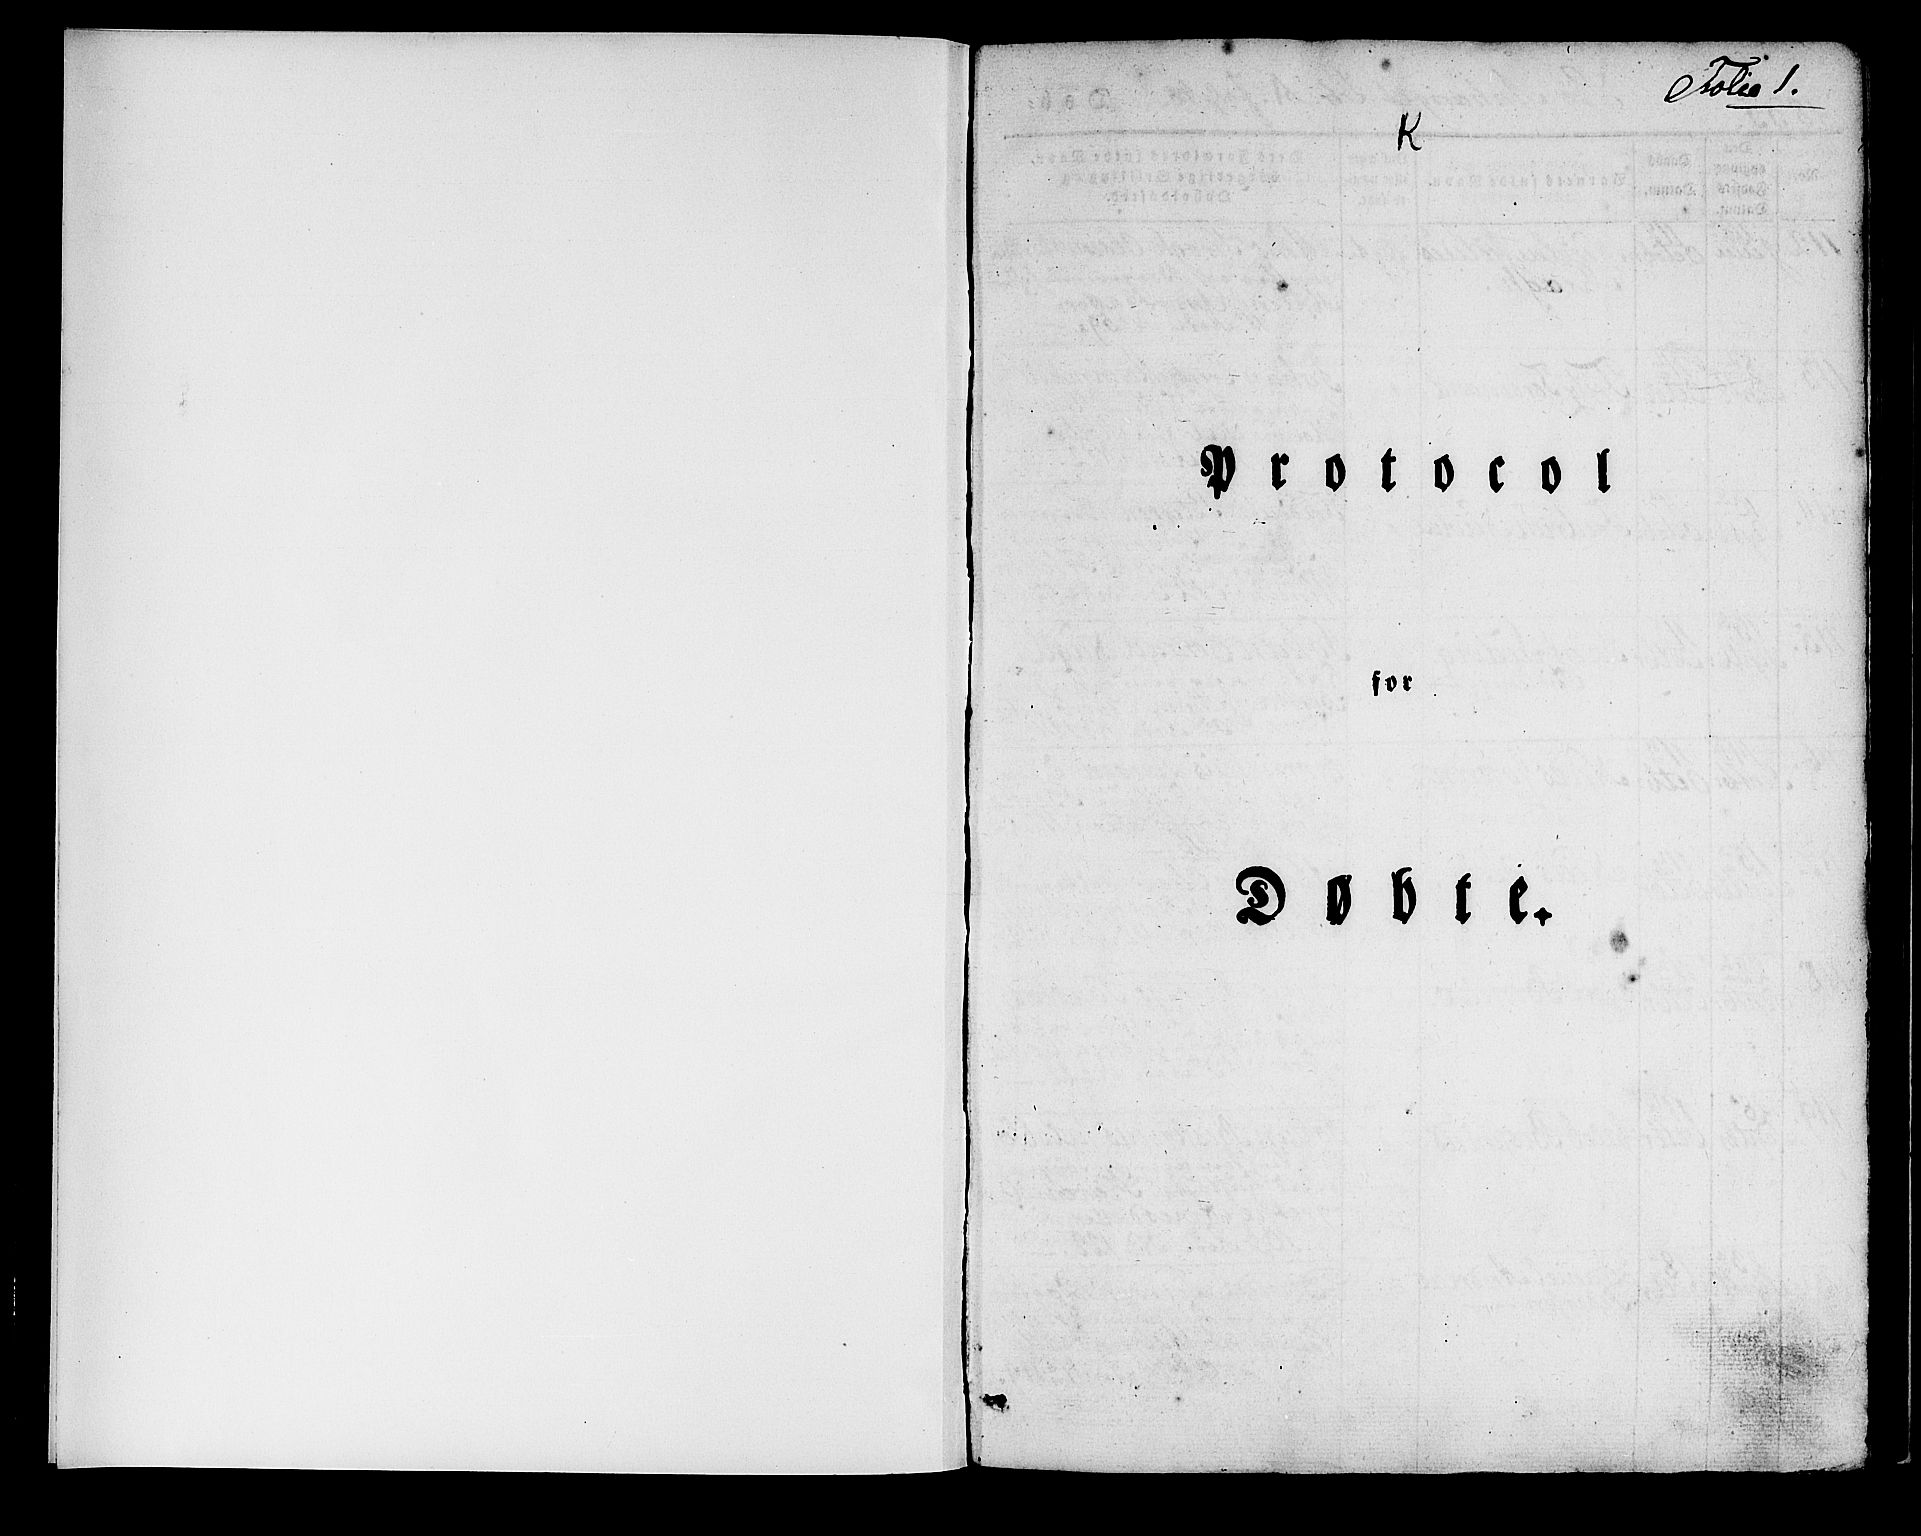 SAB, Domkirken Sokneprestembete, H/Haa/L0015: Ministerialbok nr. A 14, 1835-1840, s. 1